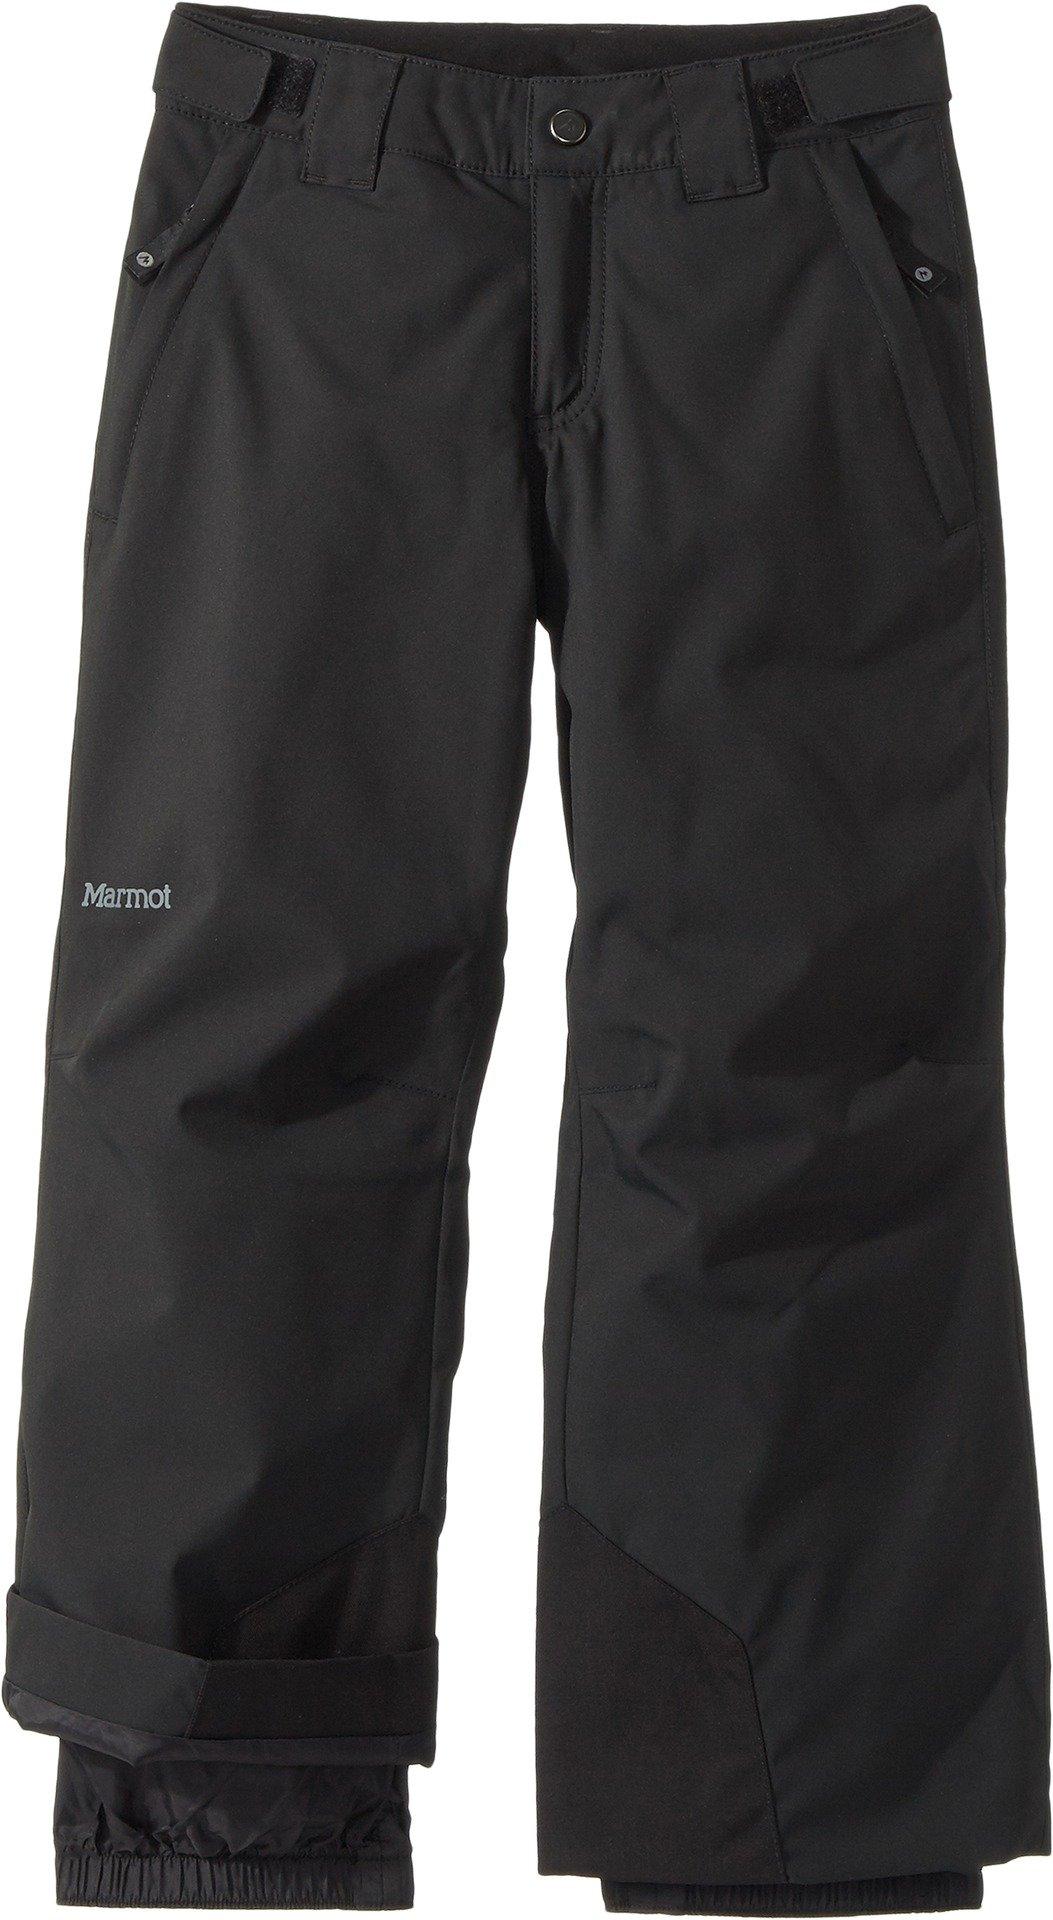 Marmot Kids Boy's Vertical Pants (Little Kids/Big Kids) Black 1 X-Small